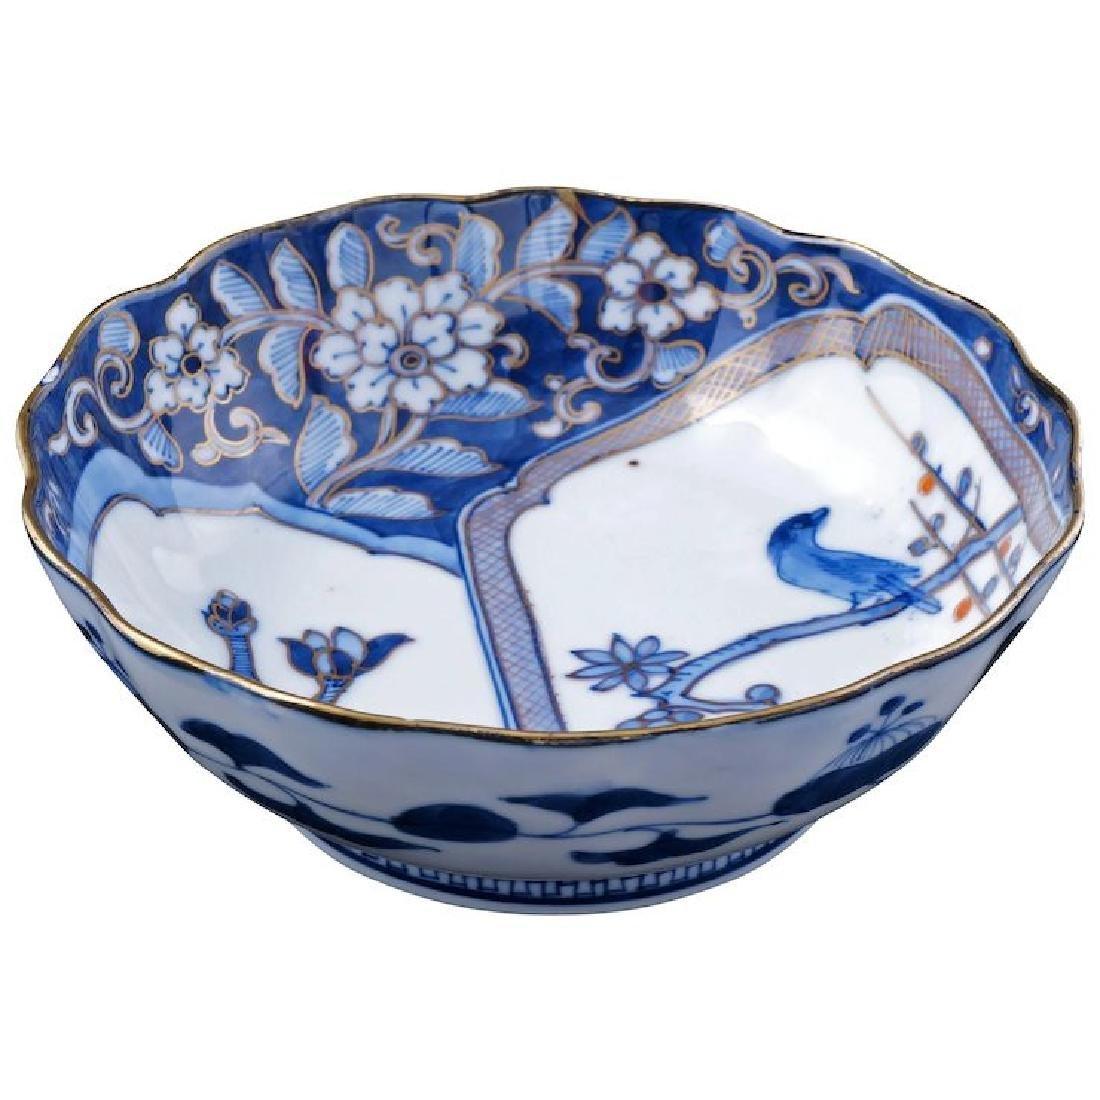 Japanese porcelain Imari dish with magnolia and bird